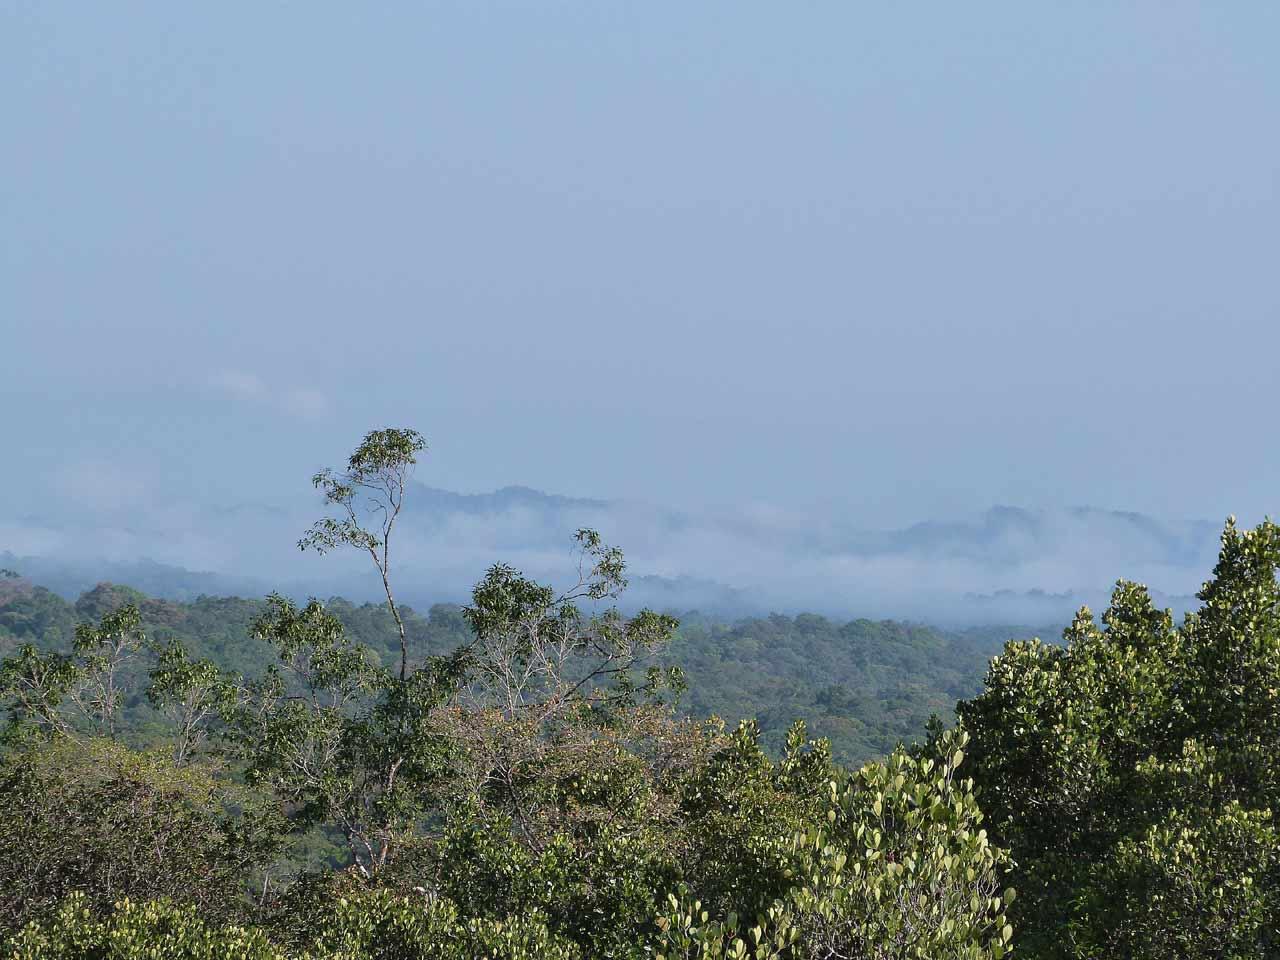 Parc amazonien de Guyane